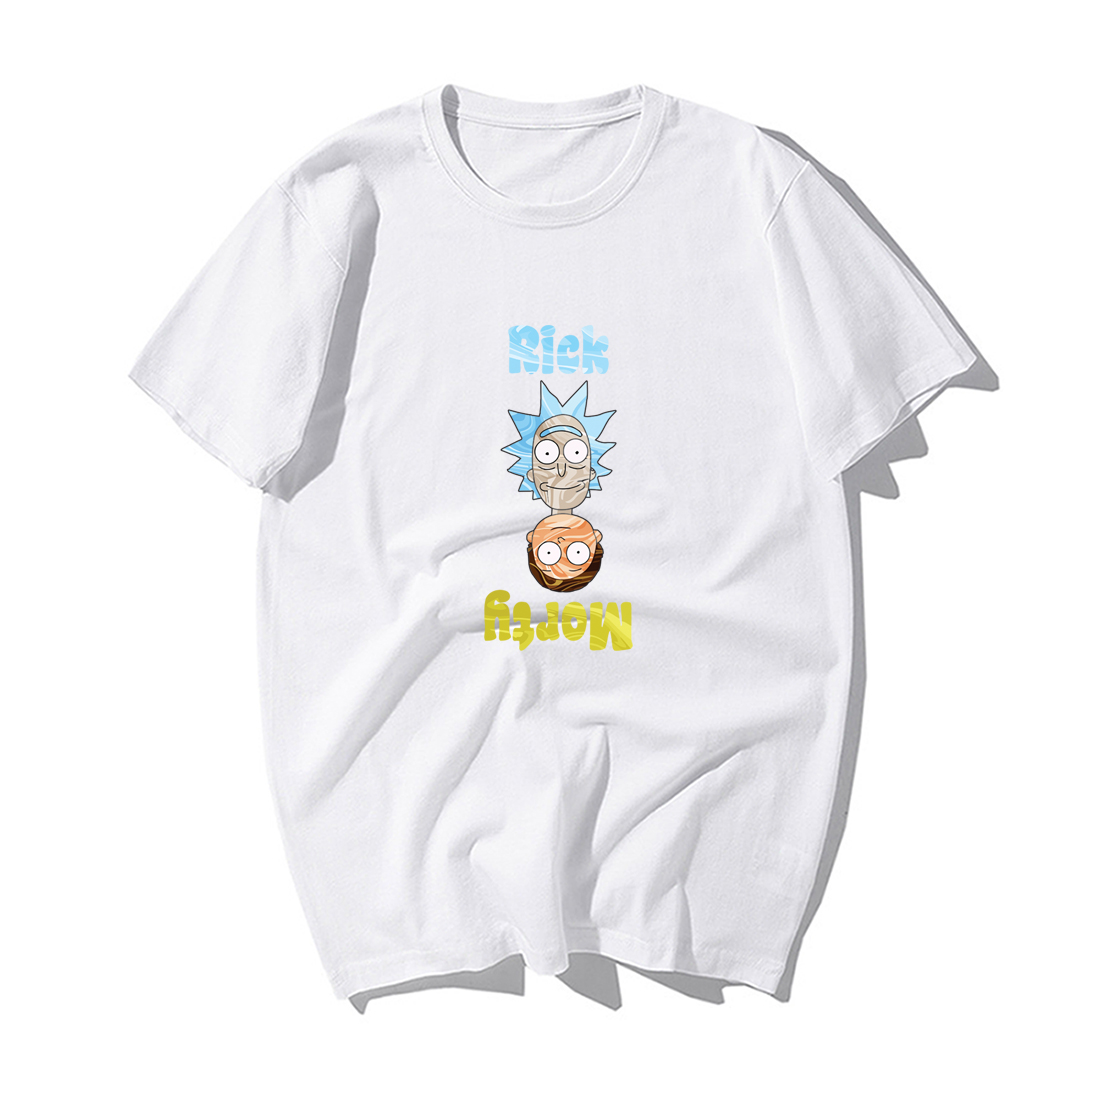 Cool RM Cartoon T-shirts